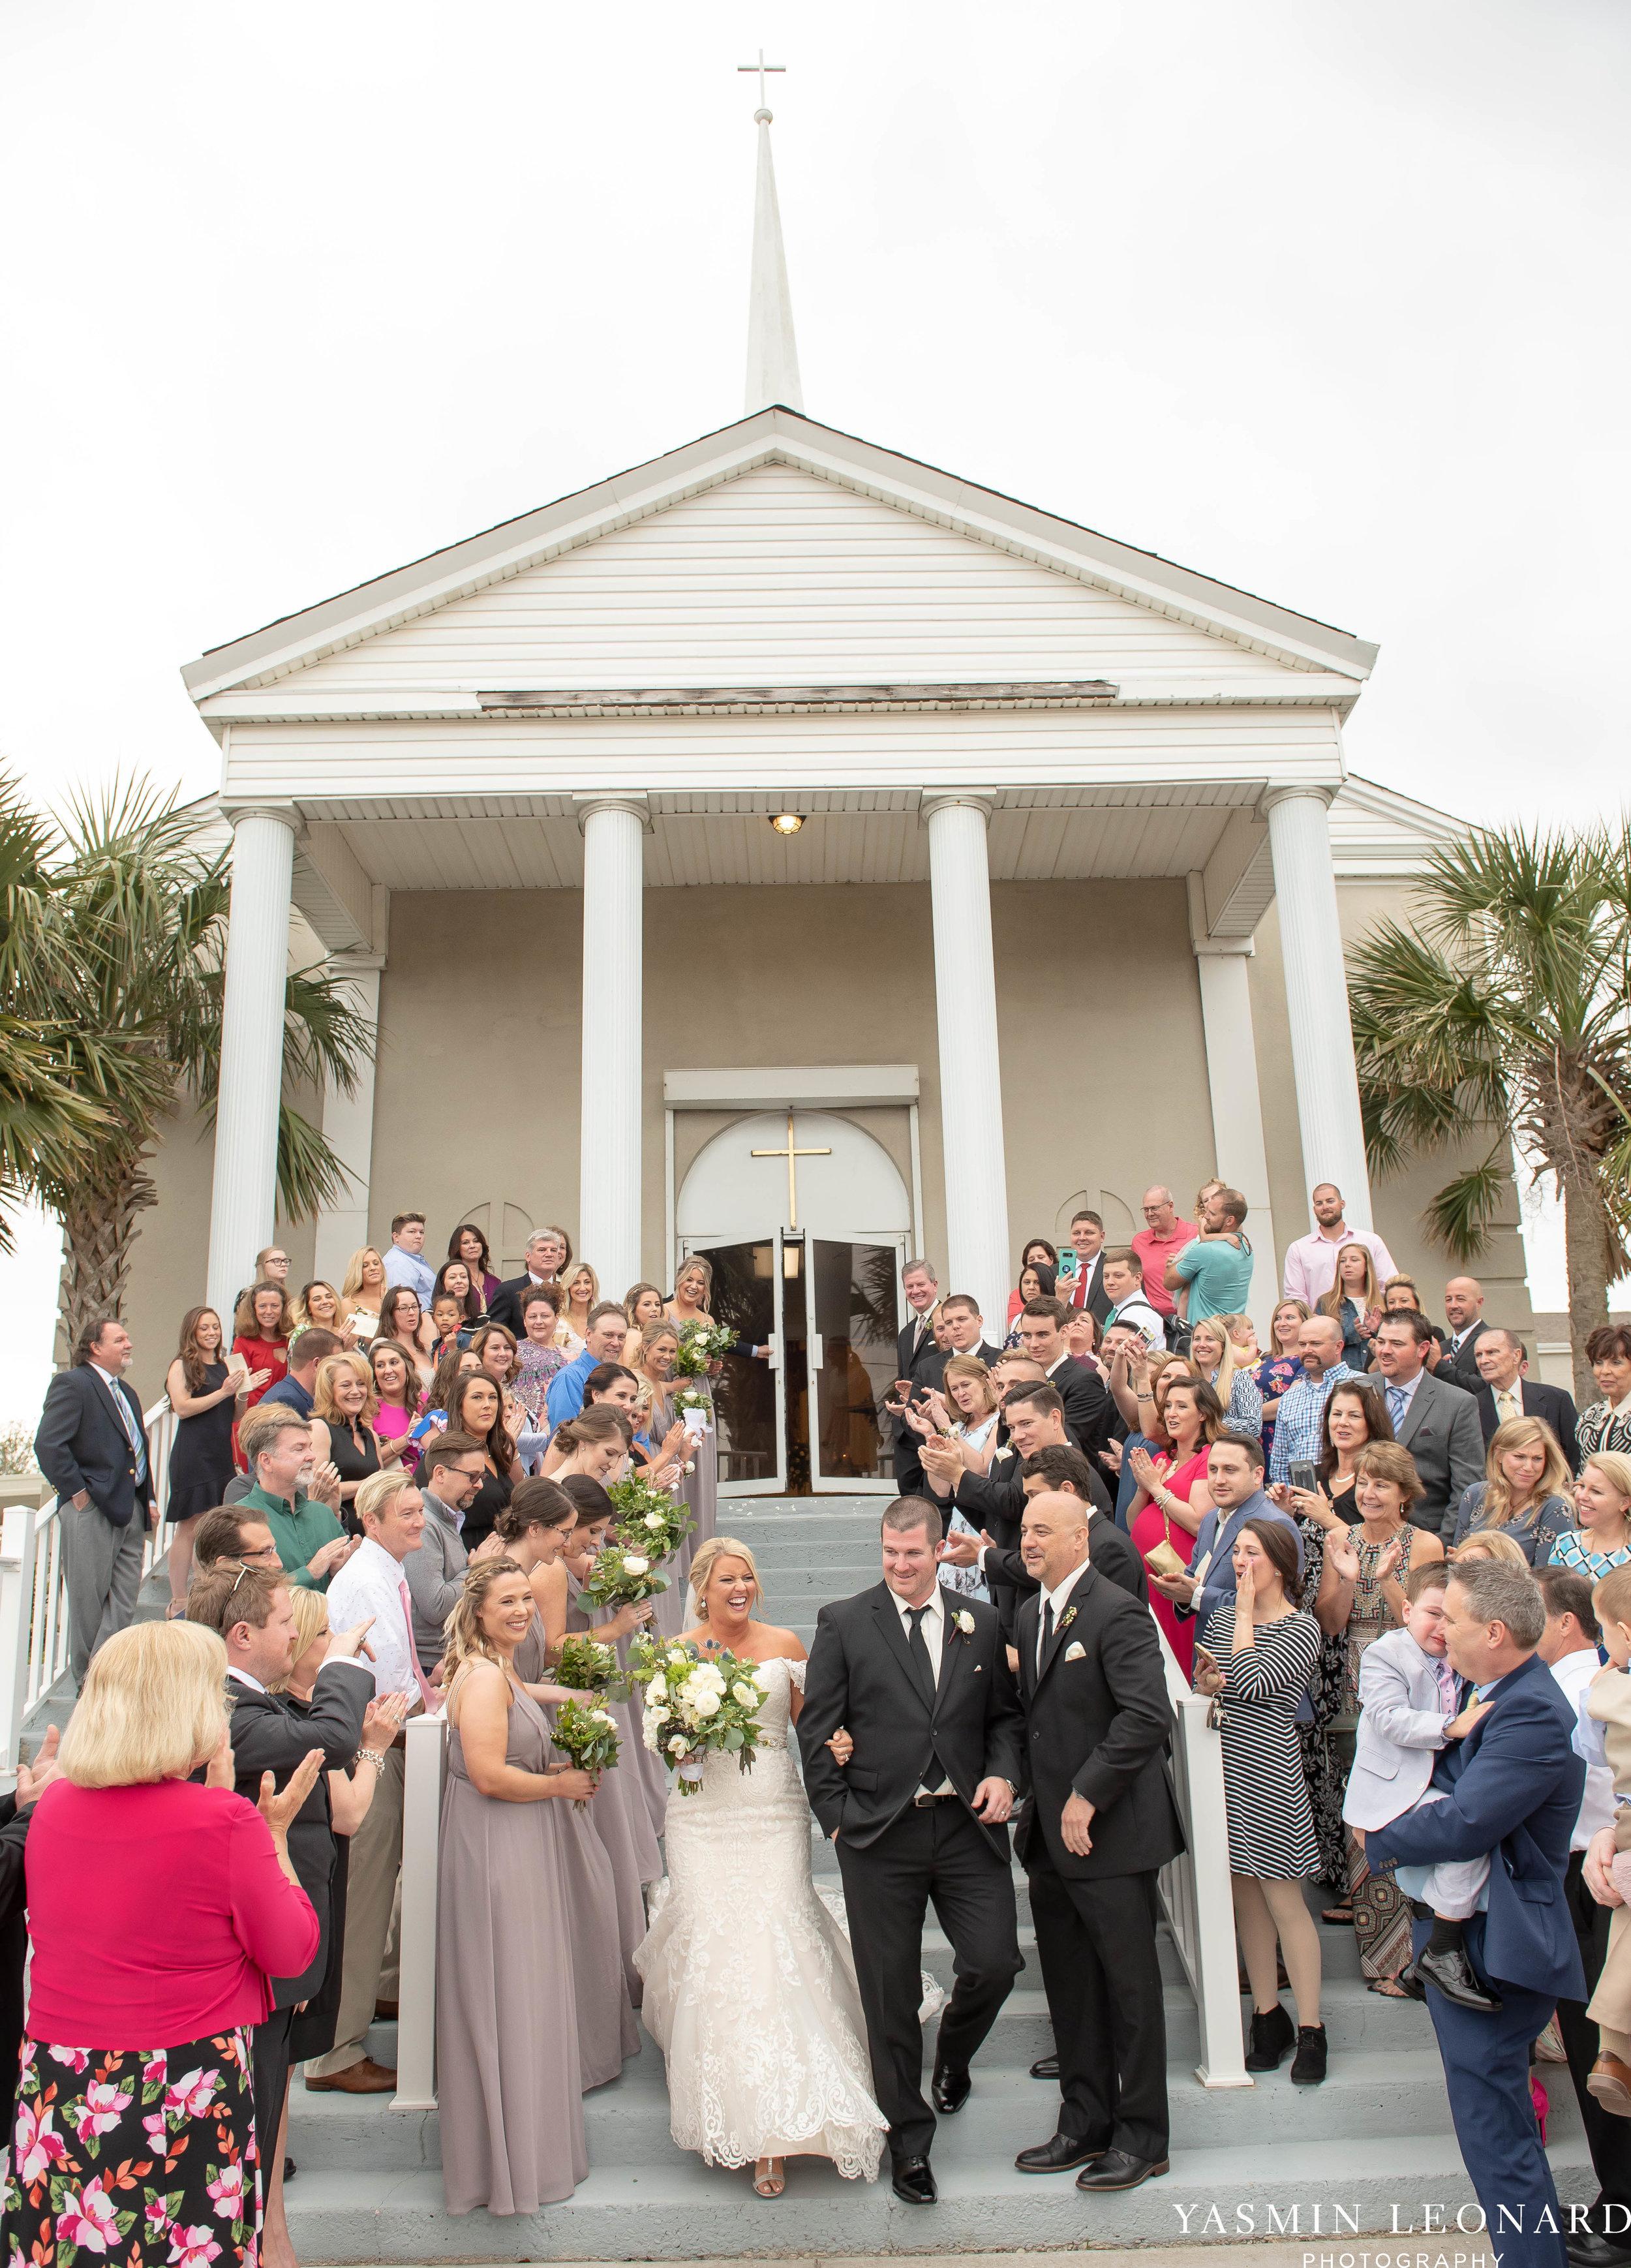 Carolina Beach Wedding - Fort Fisher Wedding - NC Acquarium - Beach Wedding - NC Wedding - Beach Wedding Inspiration - Beach Bride-23.jpg